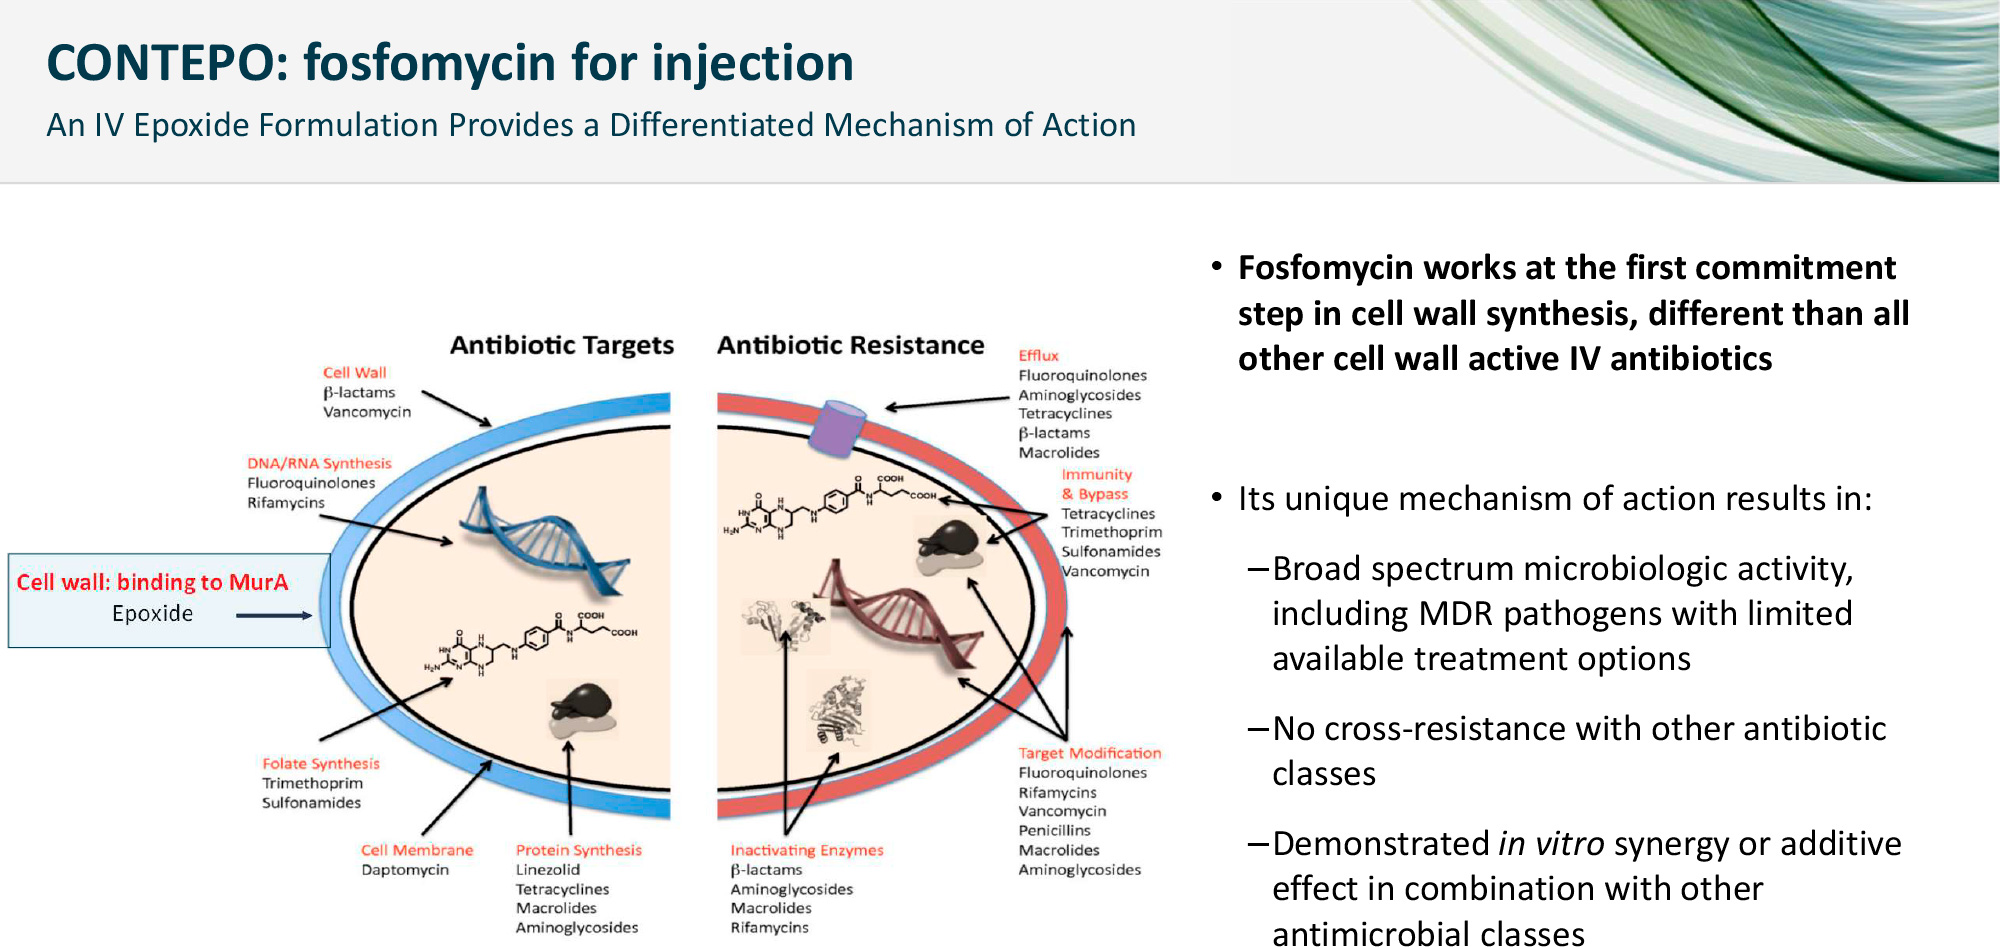 fosfomycin iv moa - Антибиотик фосфомицин опять неугоден